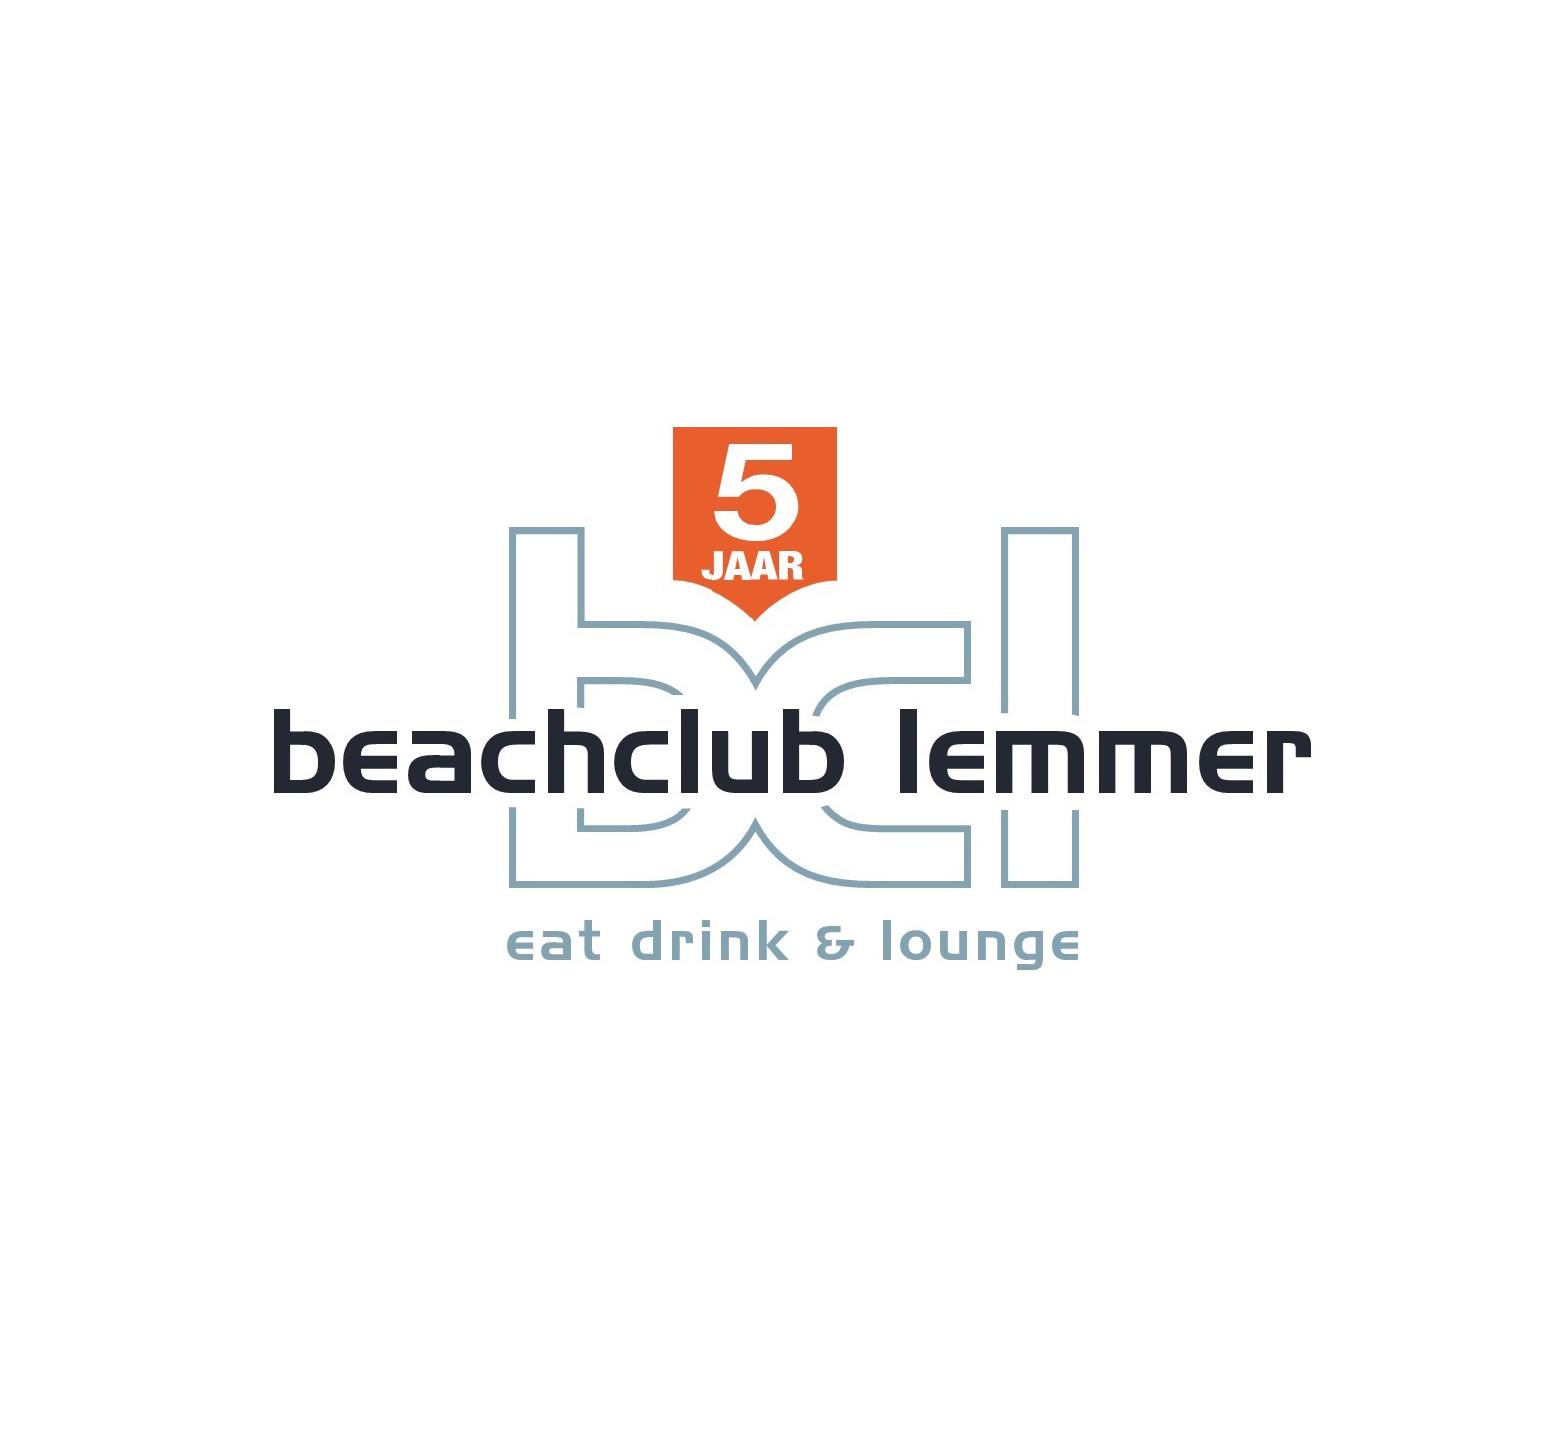 Beachclub Lemmer